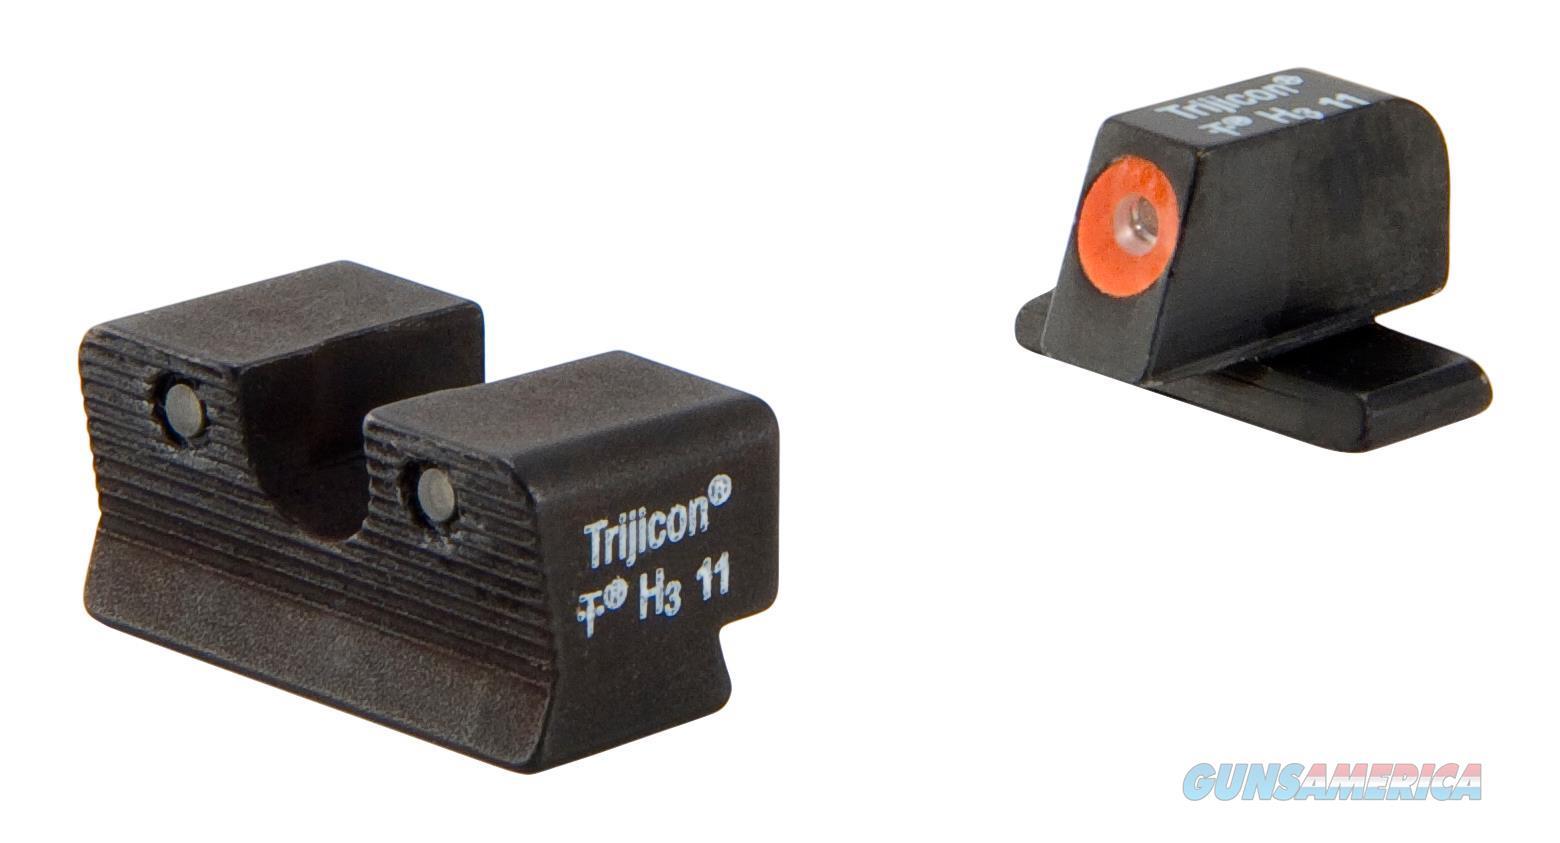 Trijicon 600752 Hd Night Sights Springfield Xd-S Tritium/Paint Blk SP102-C-600752  Non-Guns > Iron/Metal/Peep Sights